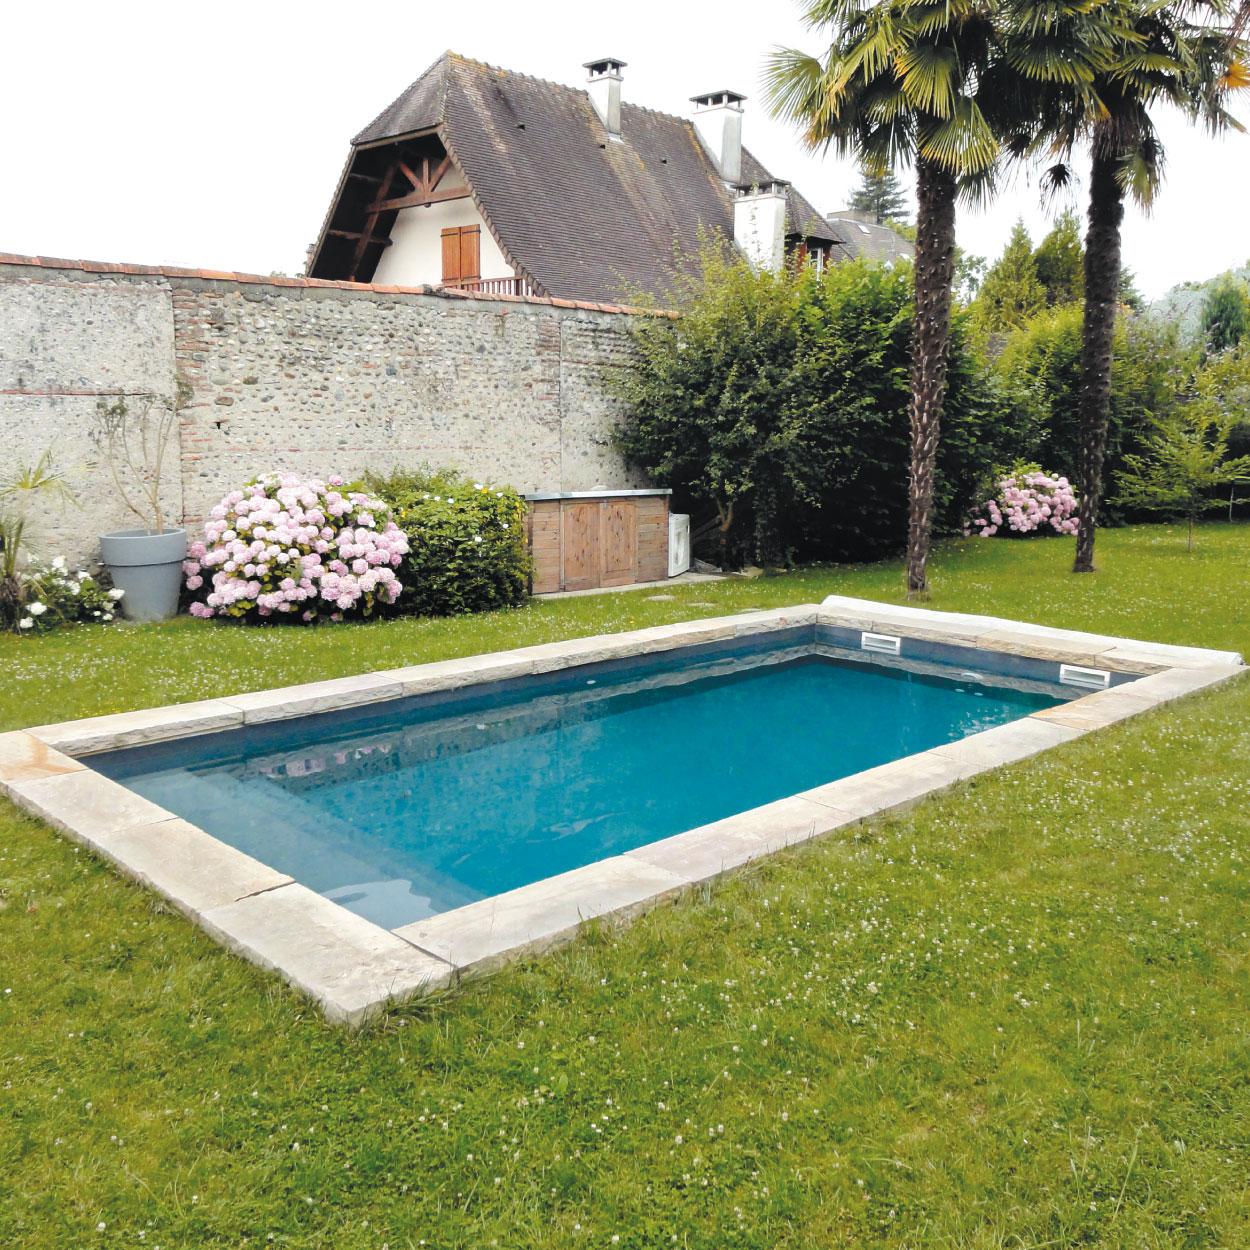 realisation-piscine-coque-bendor Modèle Bendor